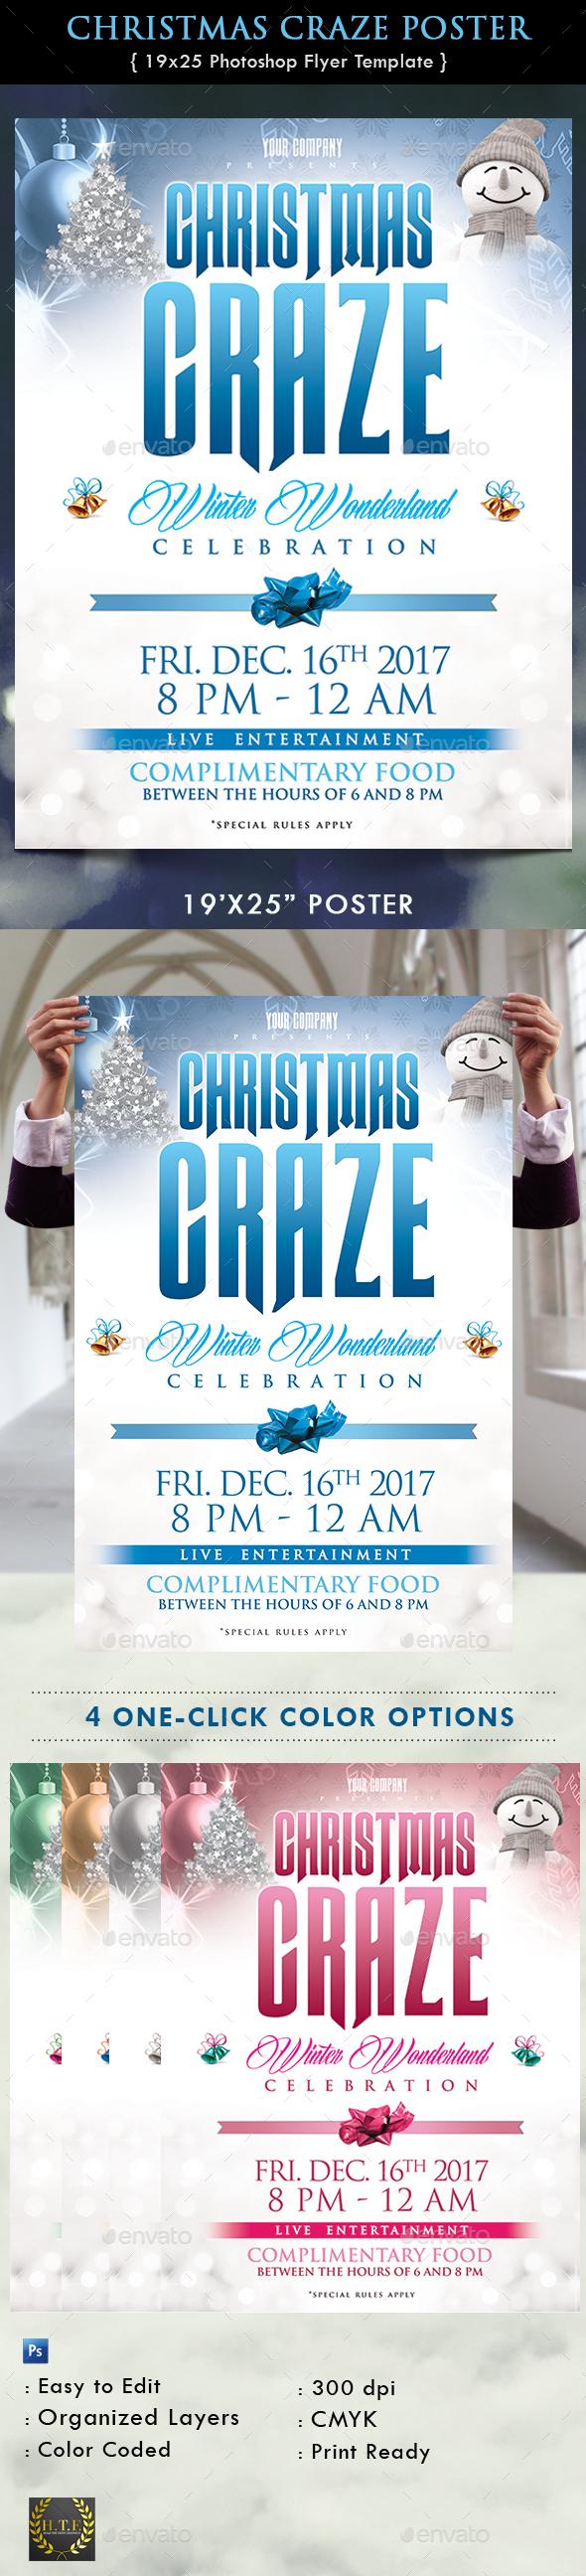 Christmas Craze Poster - Flyers Print Templates